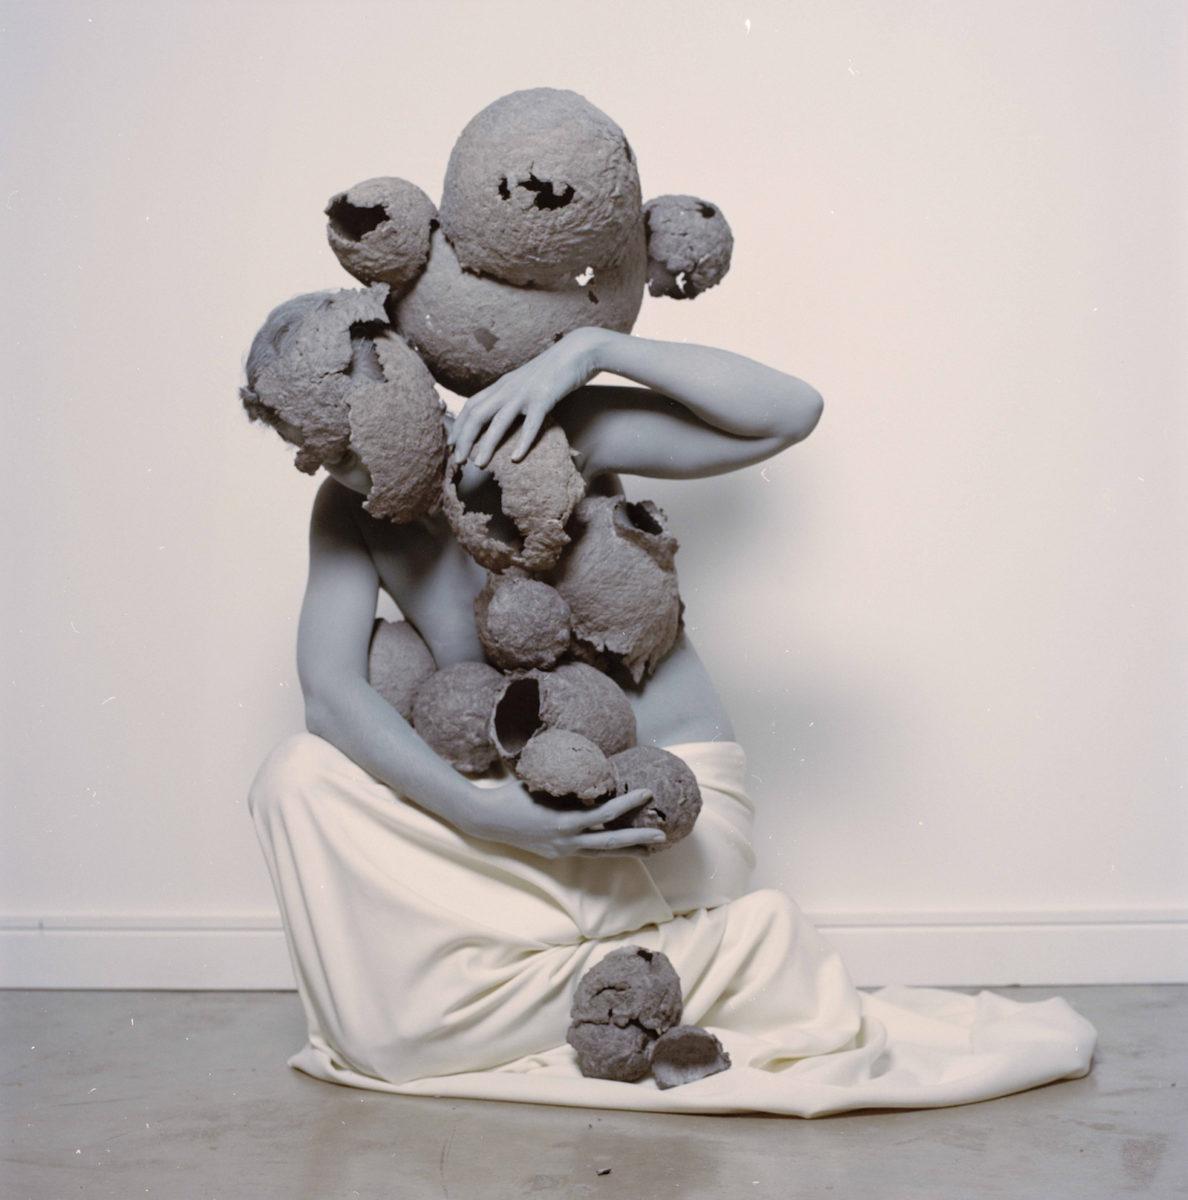 Paloma Tendero, On Mutability Series, 2020